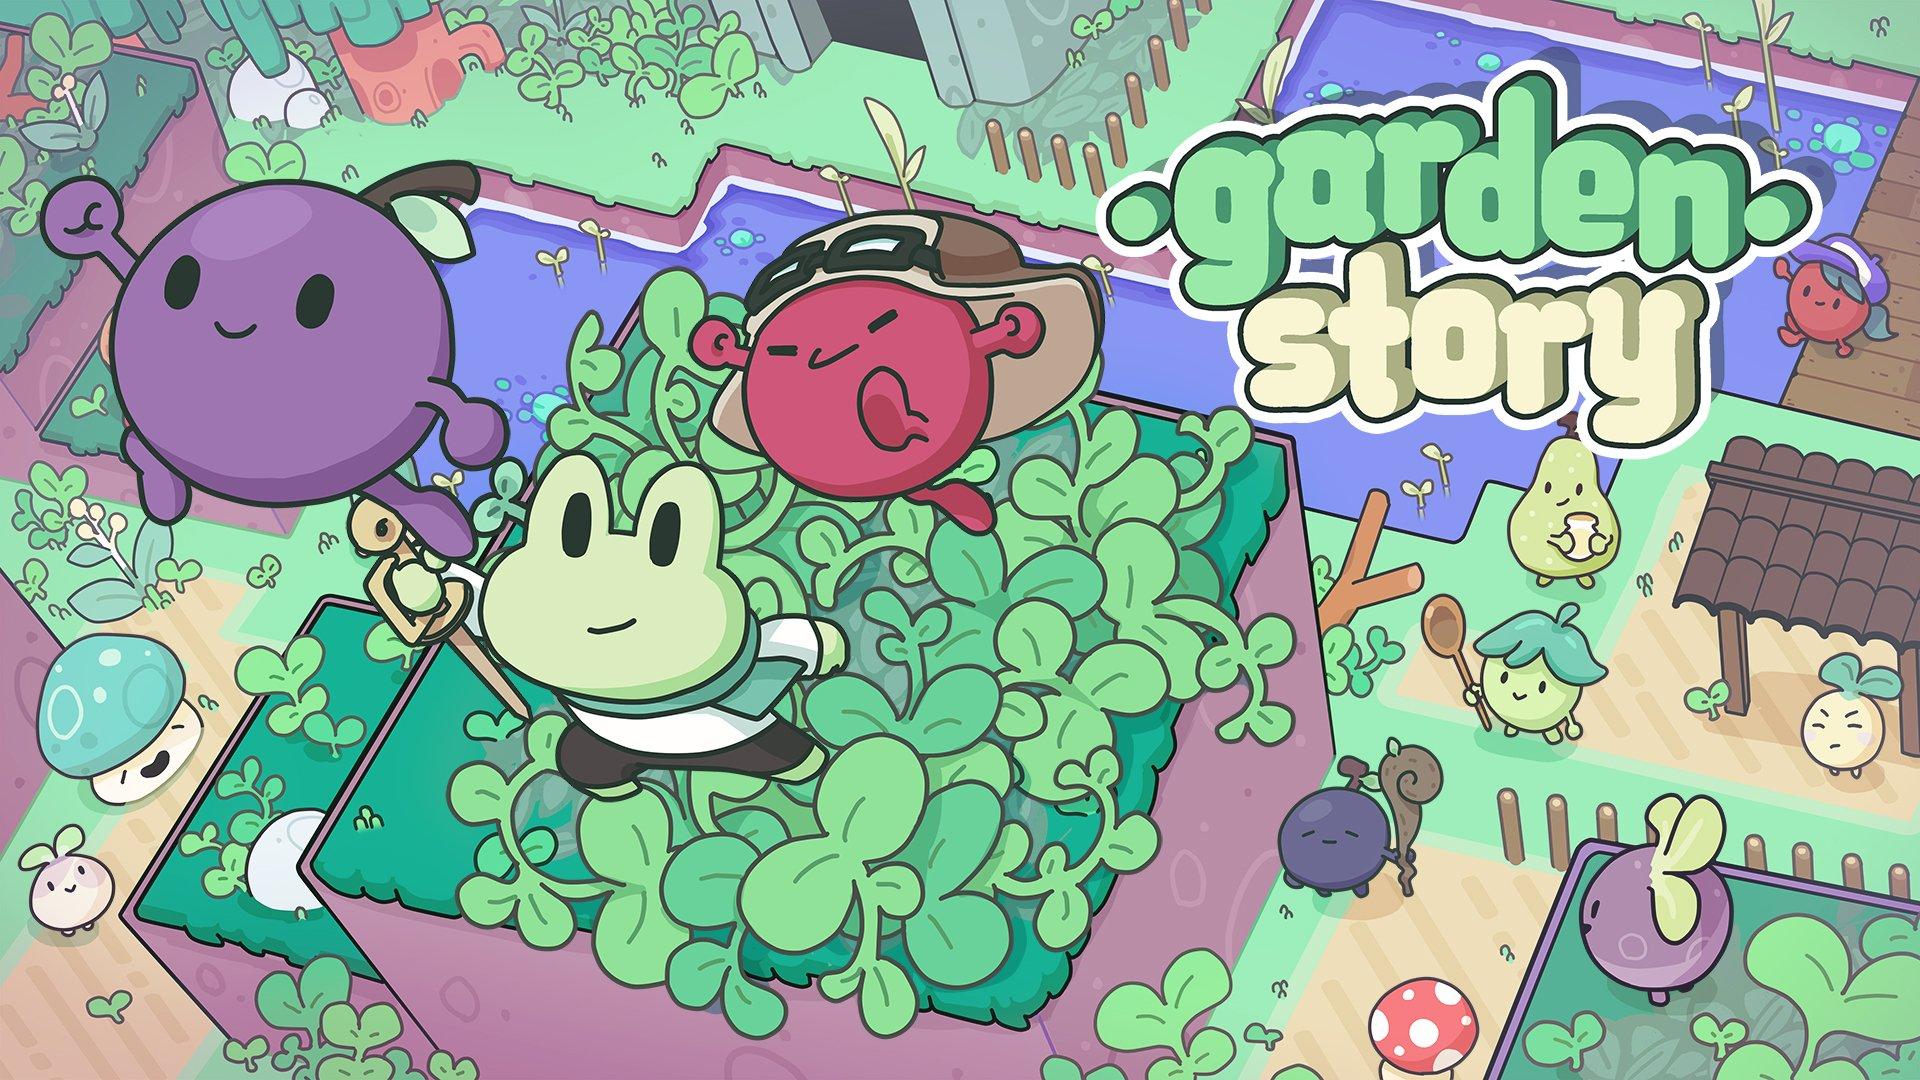 Garden Story will release on Nintendo Switch in 2021